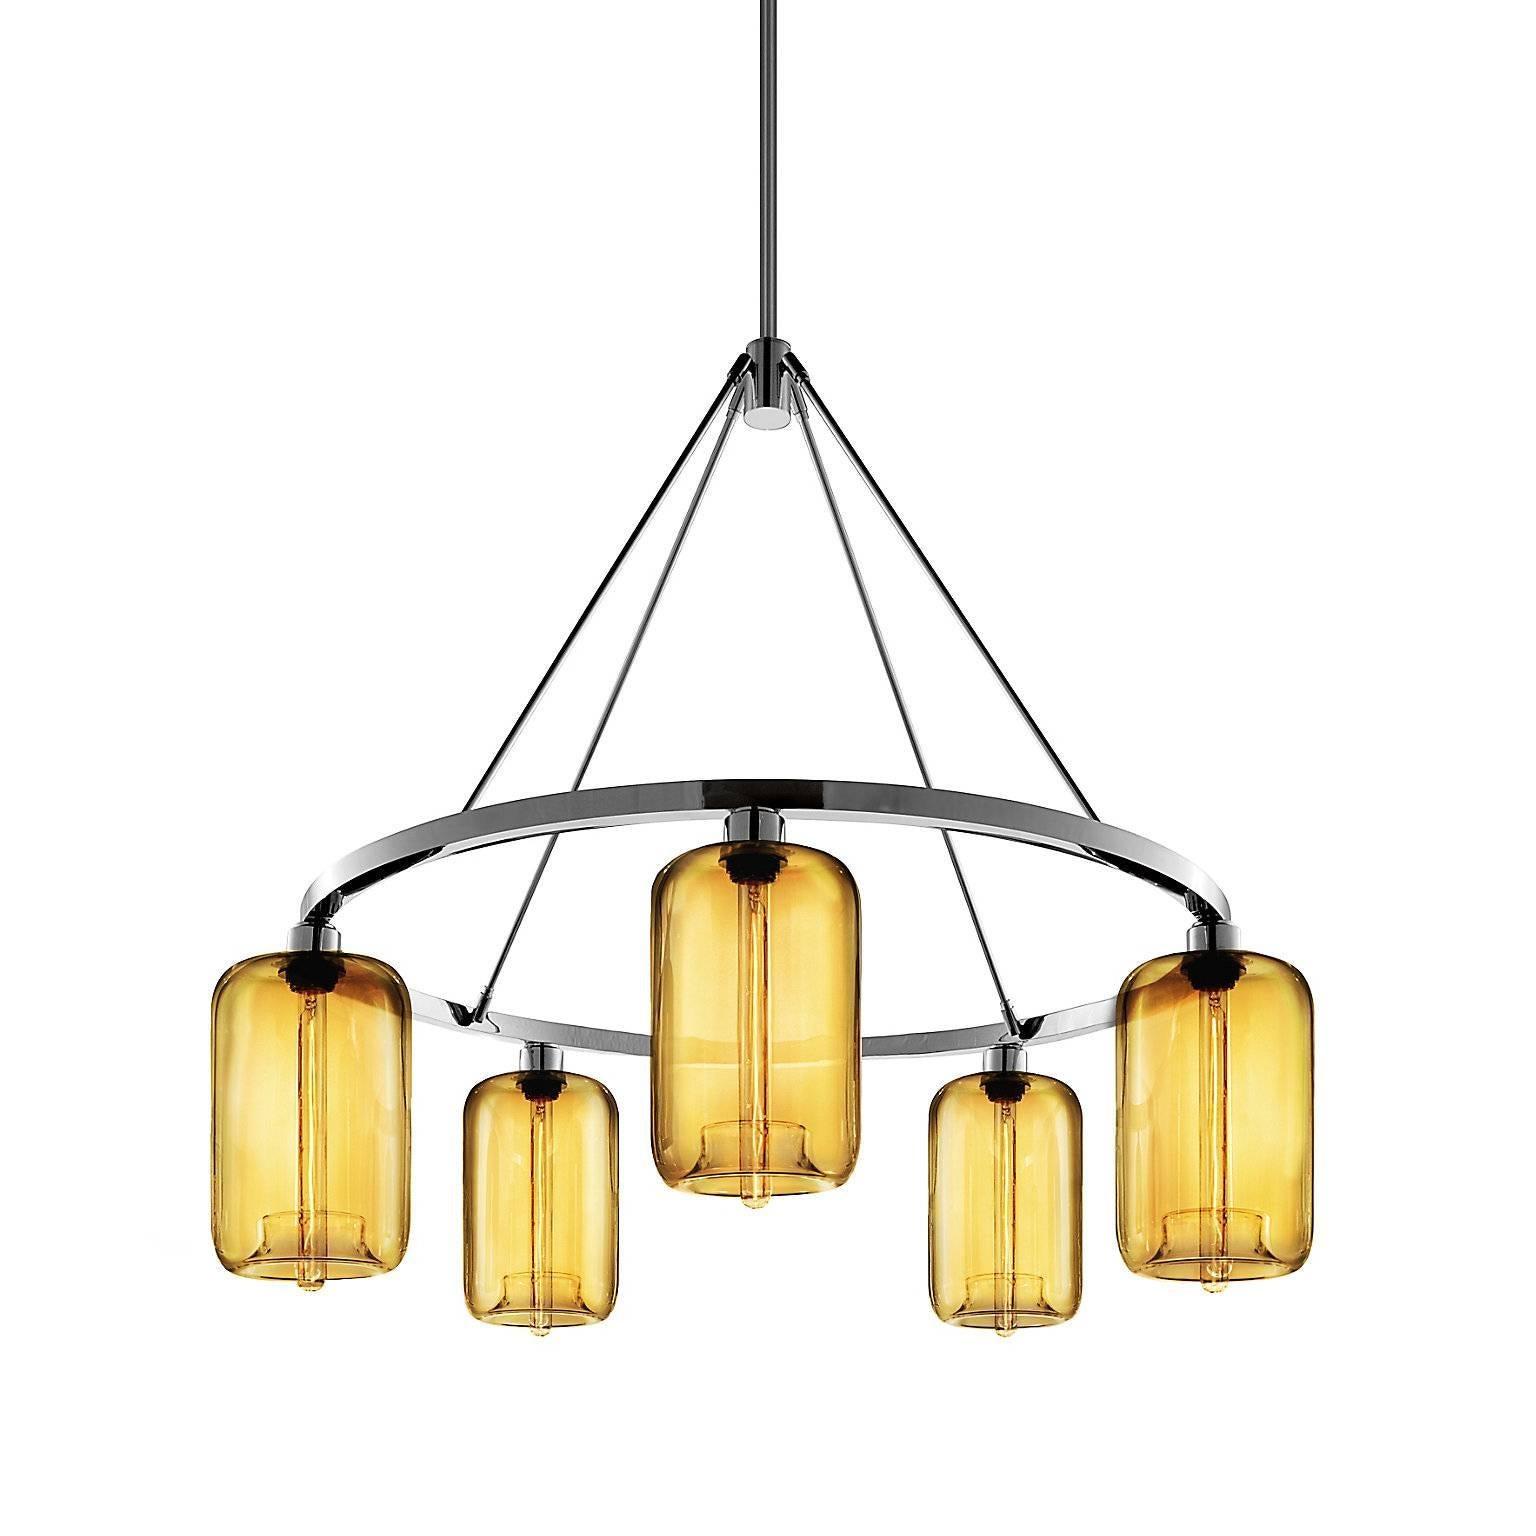 Pod Amber Handblown Modern Glass Polished Nickel Chandelier Light